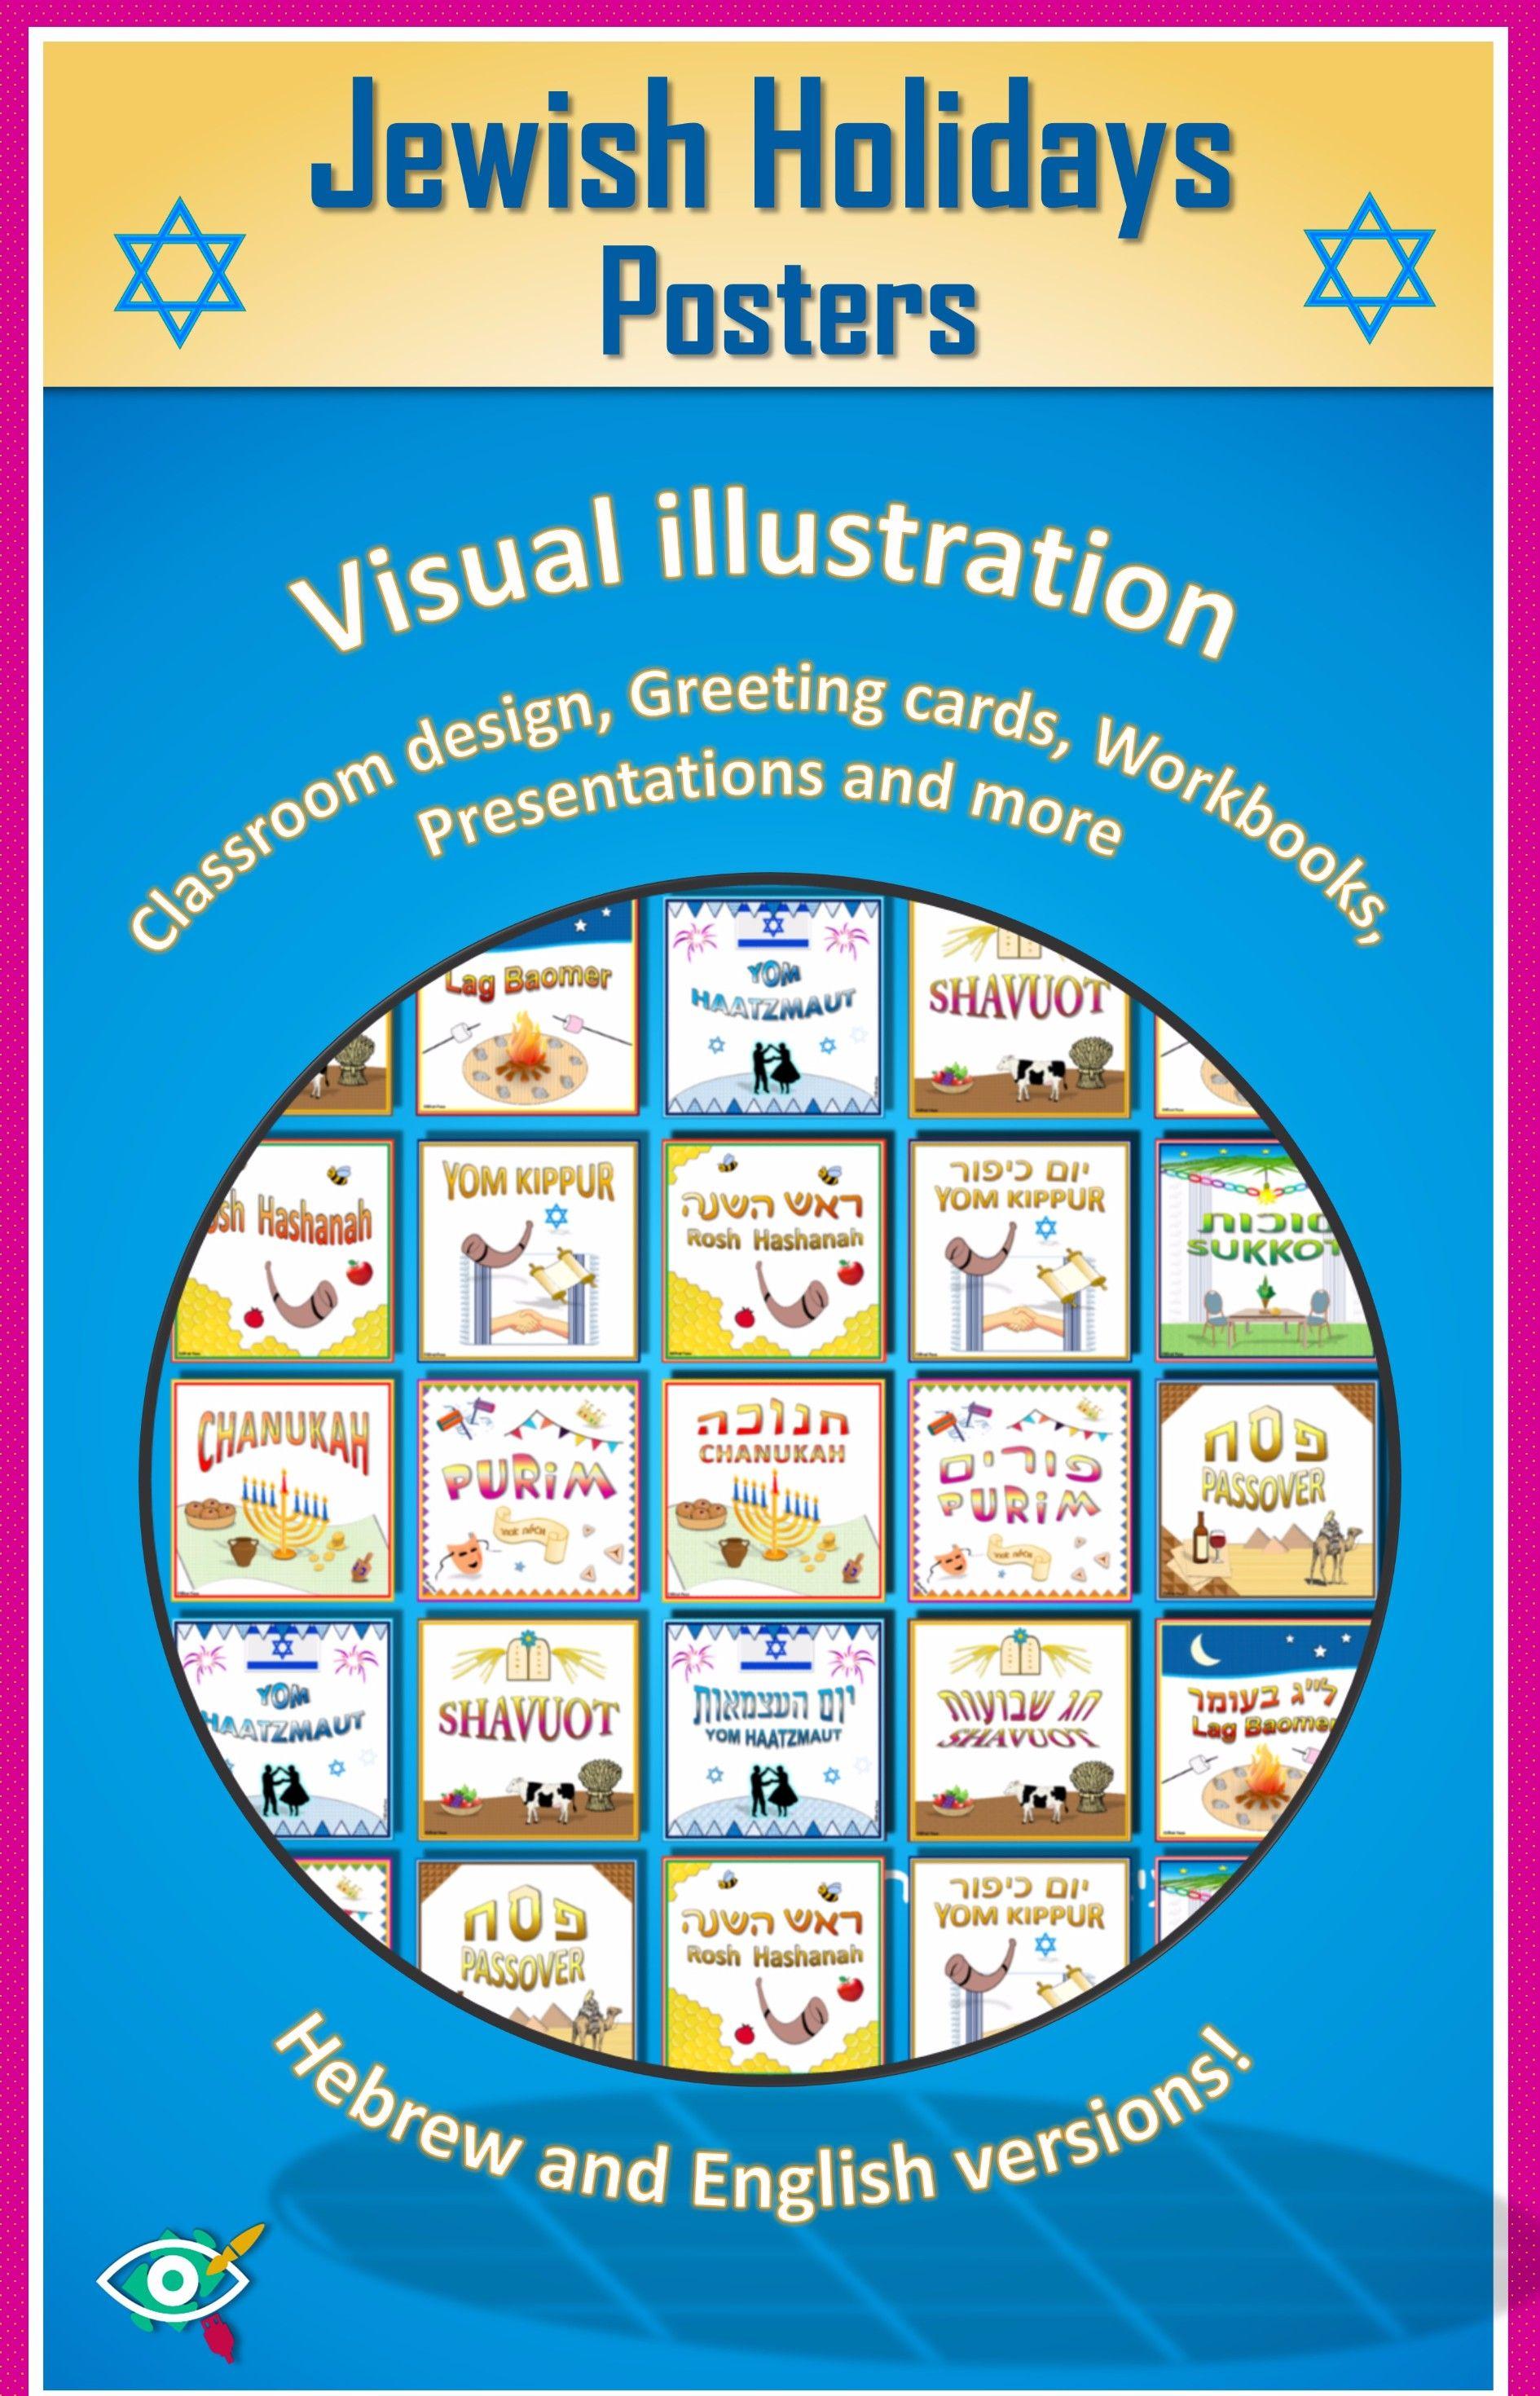 Jewish Holidays Posters Best Of Planerium Pinterest Classroom